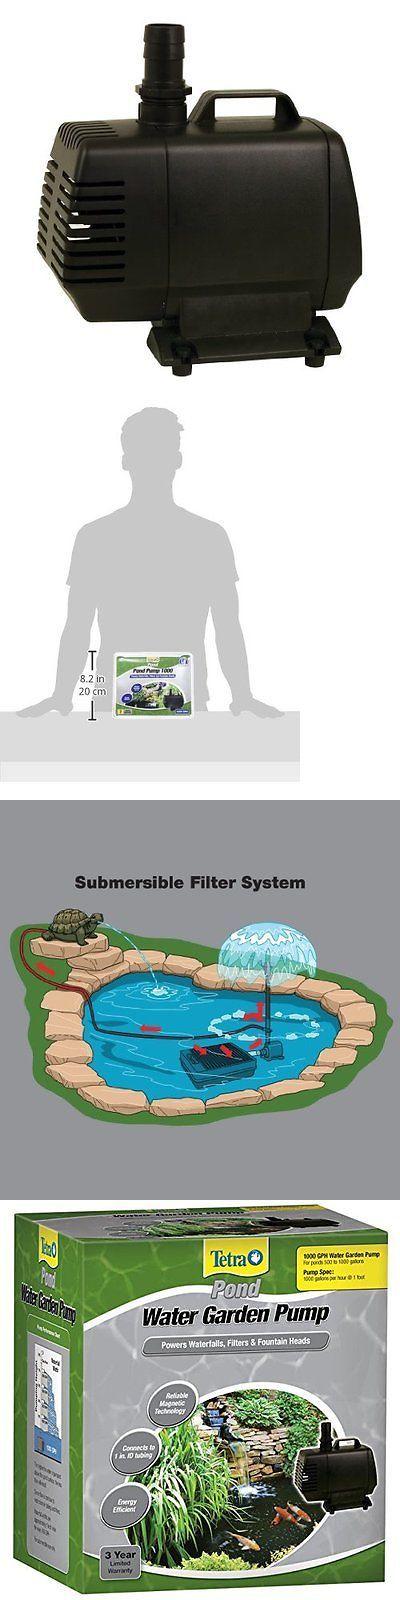 Fish Pond Supplies 134750: Tetra Pond Water Garden Pump 1000 Gph Koi Pond Pump BUY IT NOW ONLY: $77.29